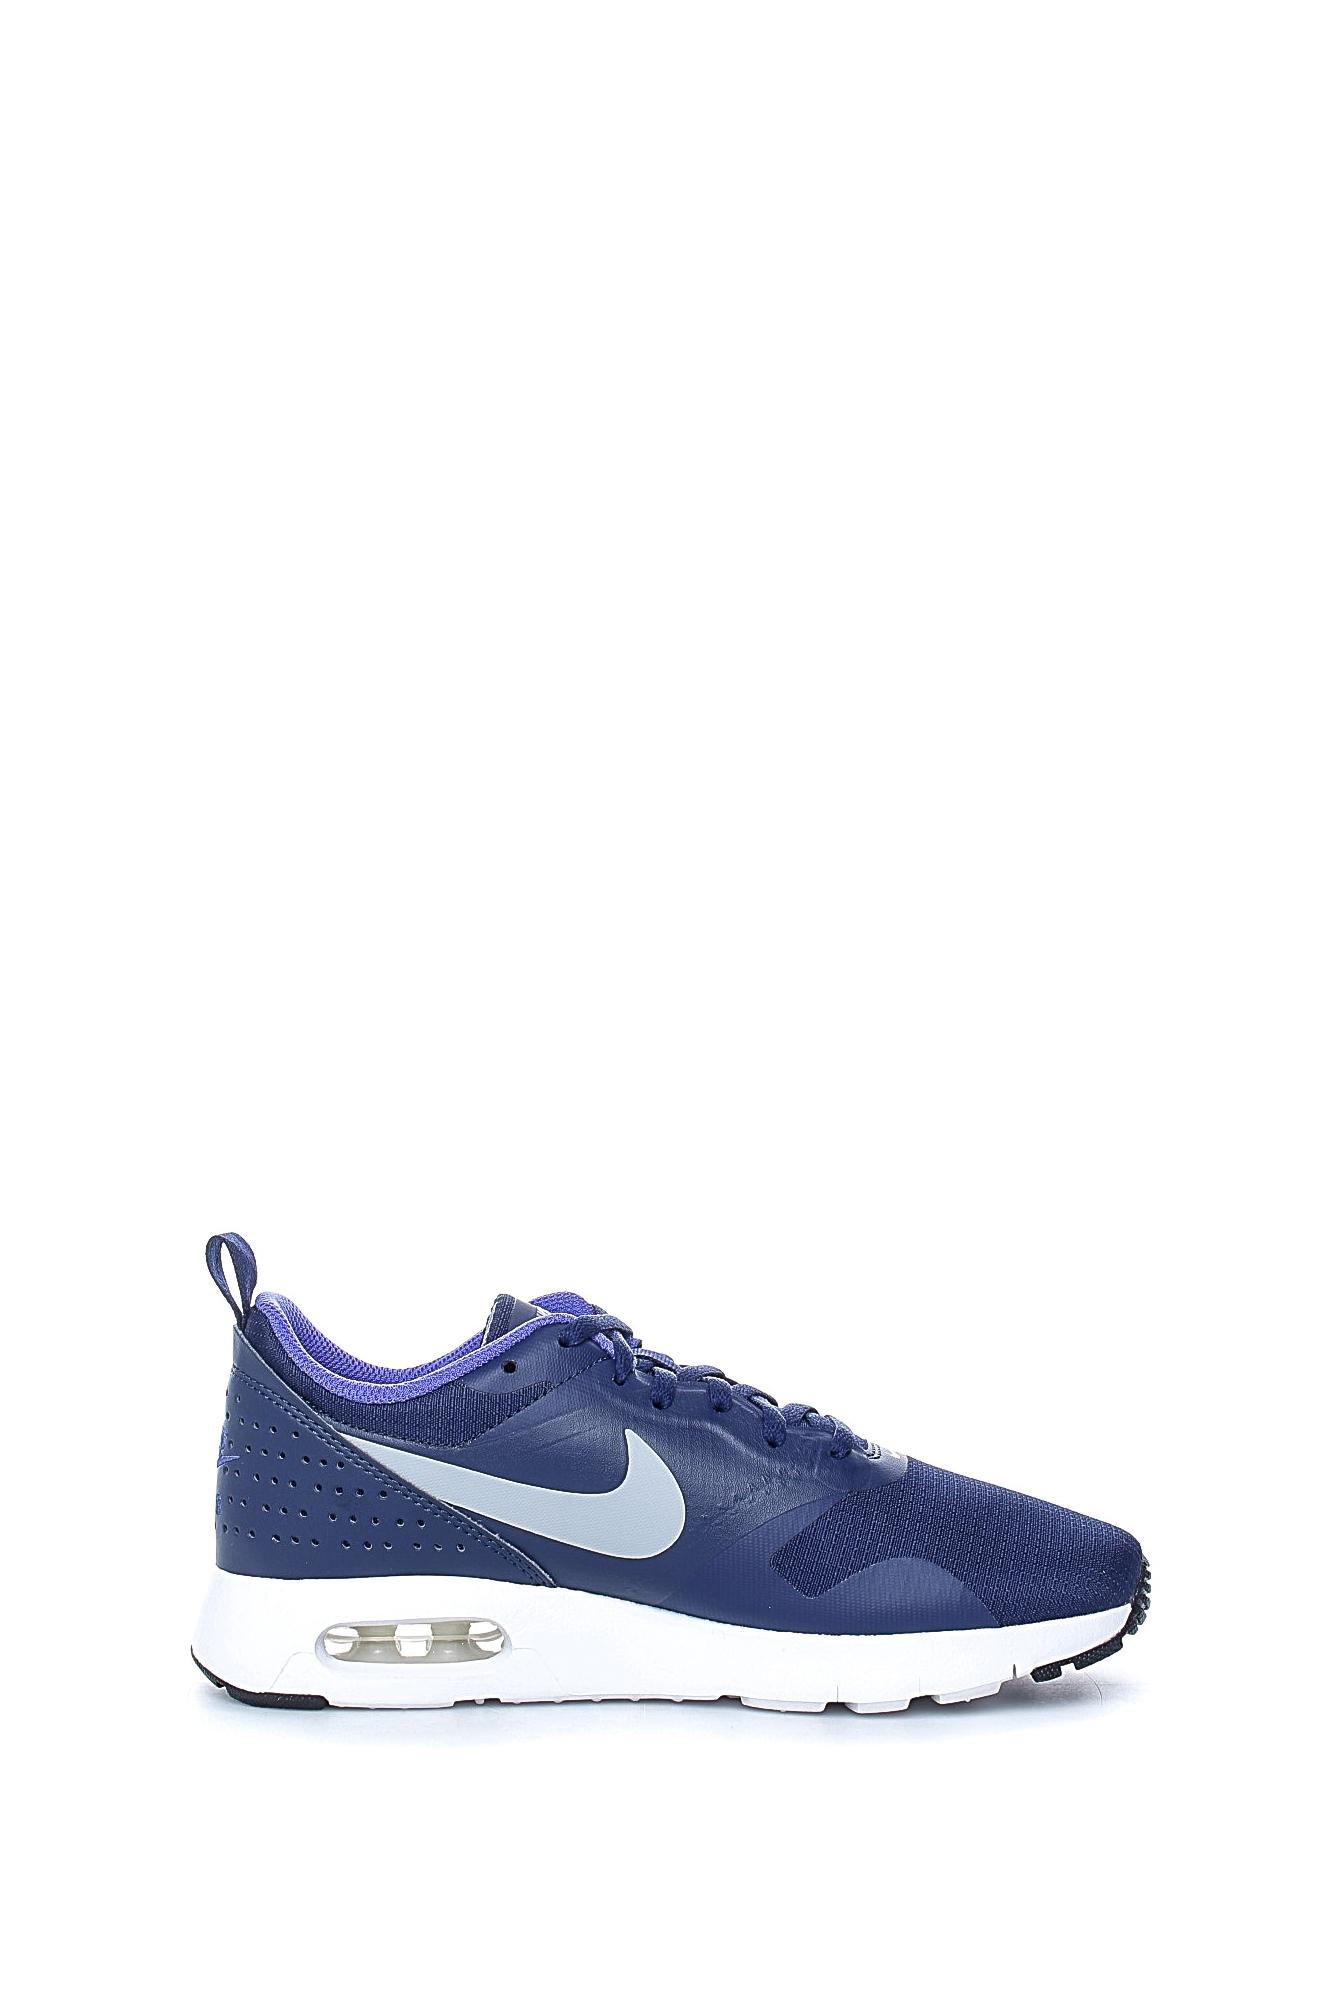 NIKE - Παιδικά αθλητικά παπούτσια NIKE AIR MAX TAVAS (GS) μπλε ... 9e3943a3c8f